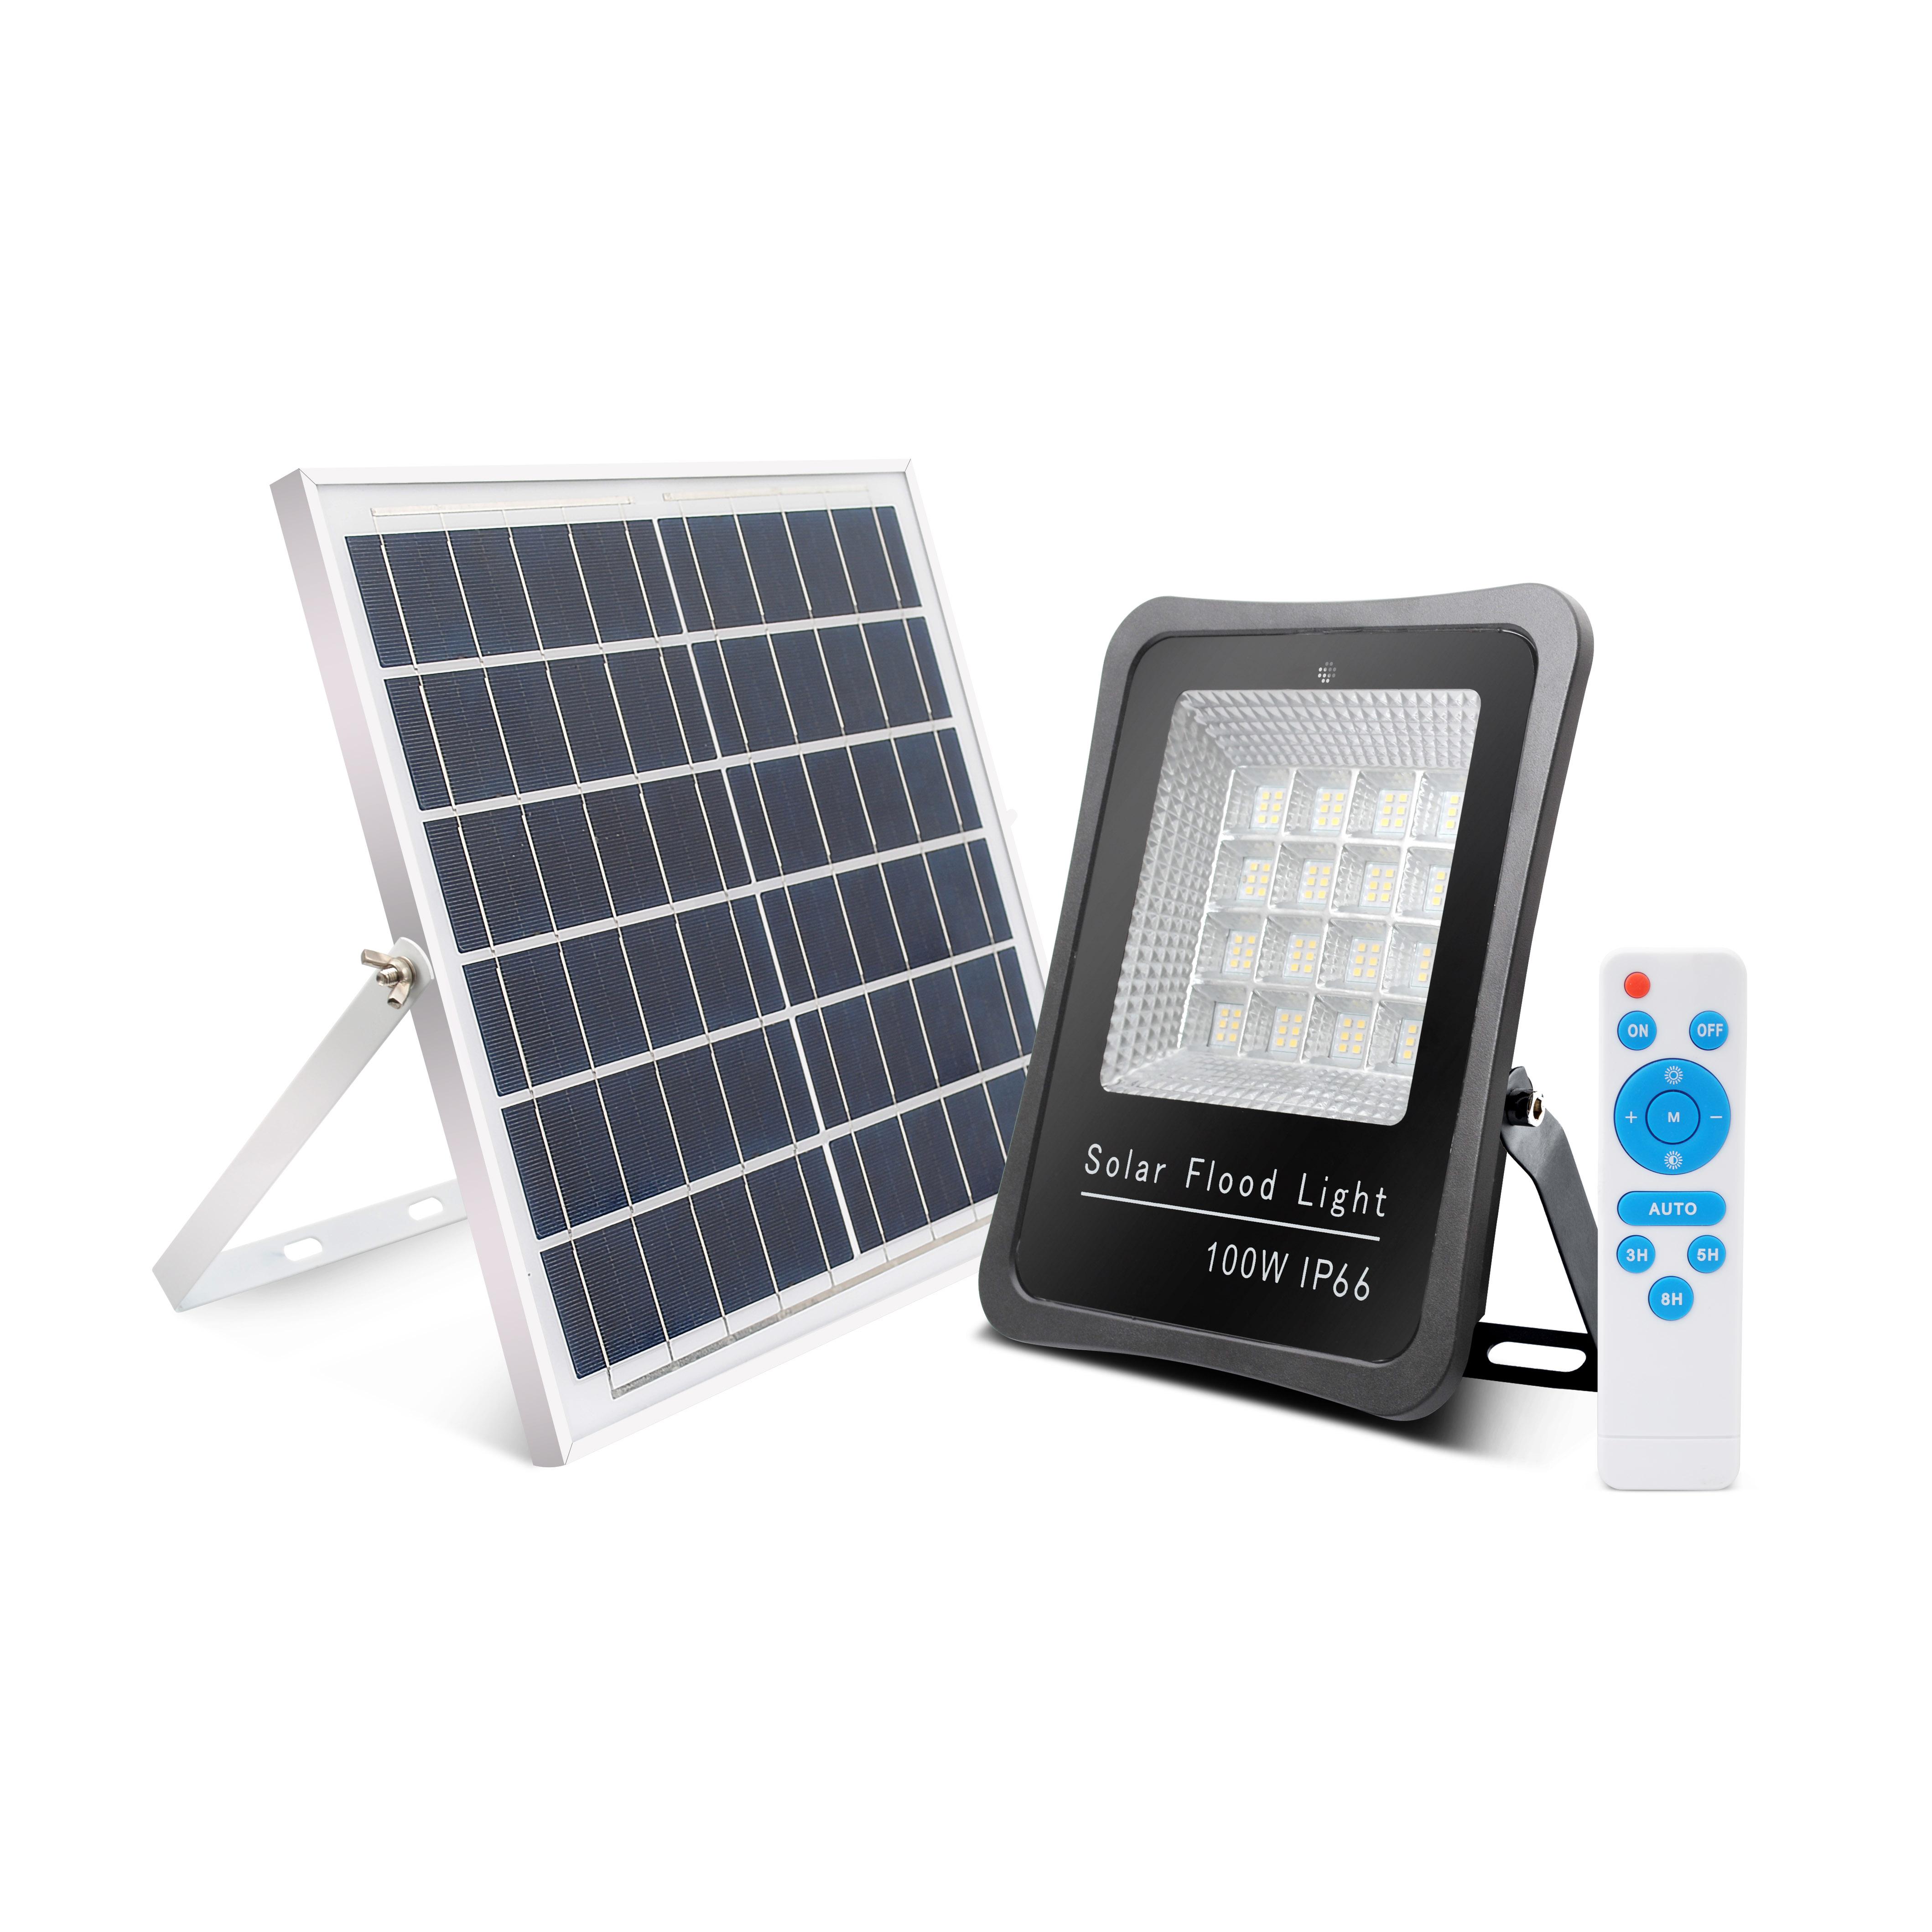 Outdoor Waterproof sensor 100watt solar IP66 led solar powered flood light price